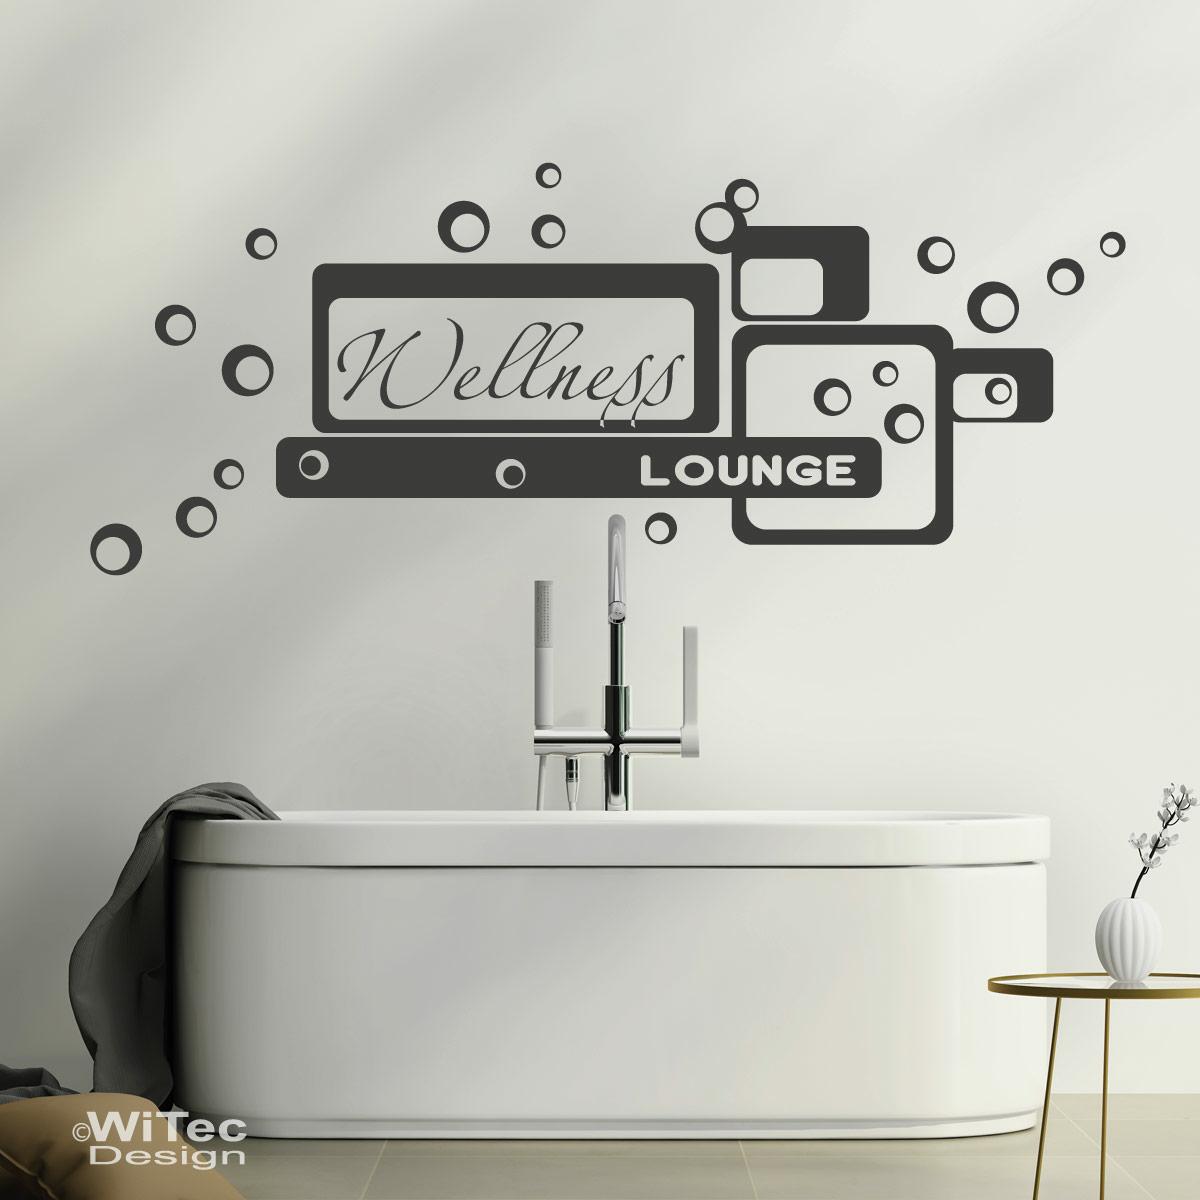 wandtattoo wellness lounge wandaufkleber badezimmer. Black Bedroom Furniture Sets. Home Design Ideas